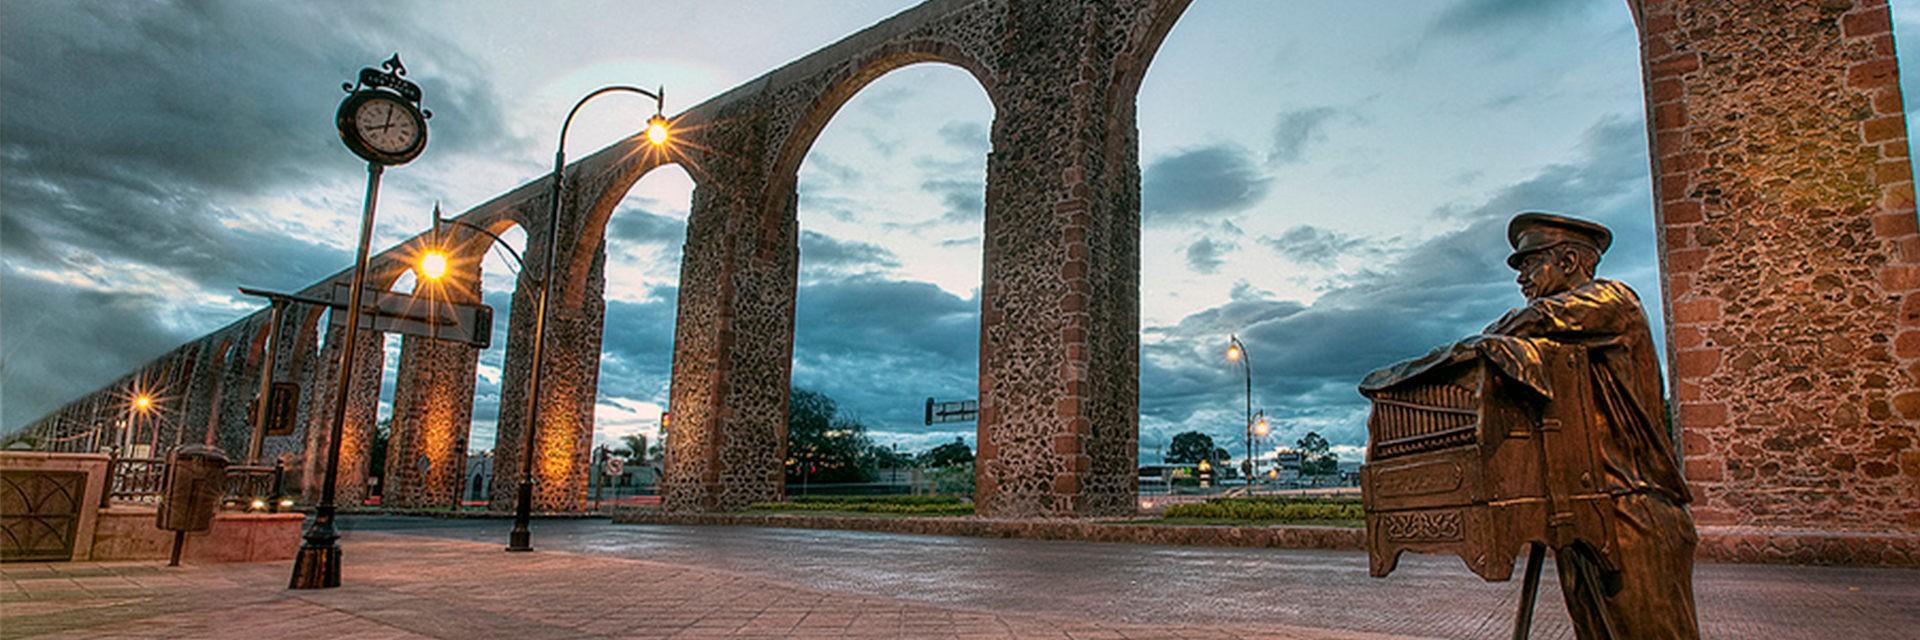 Foto panoramica de Queretaro